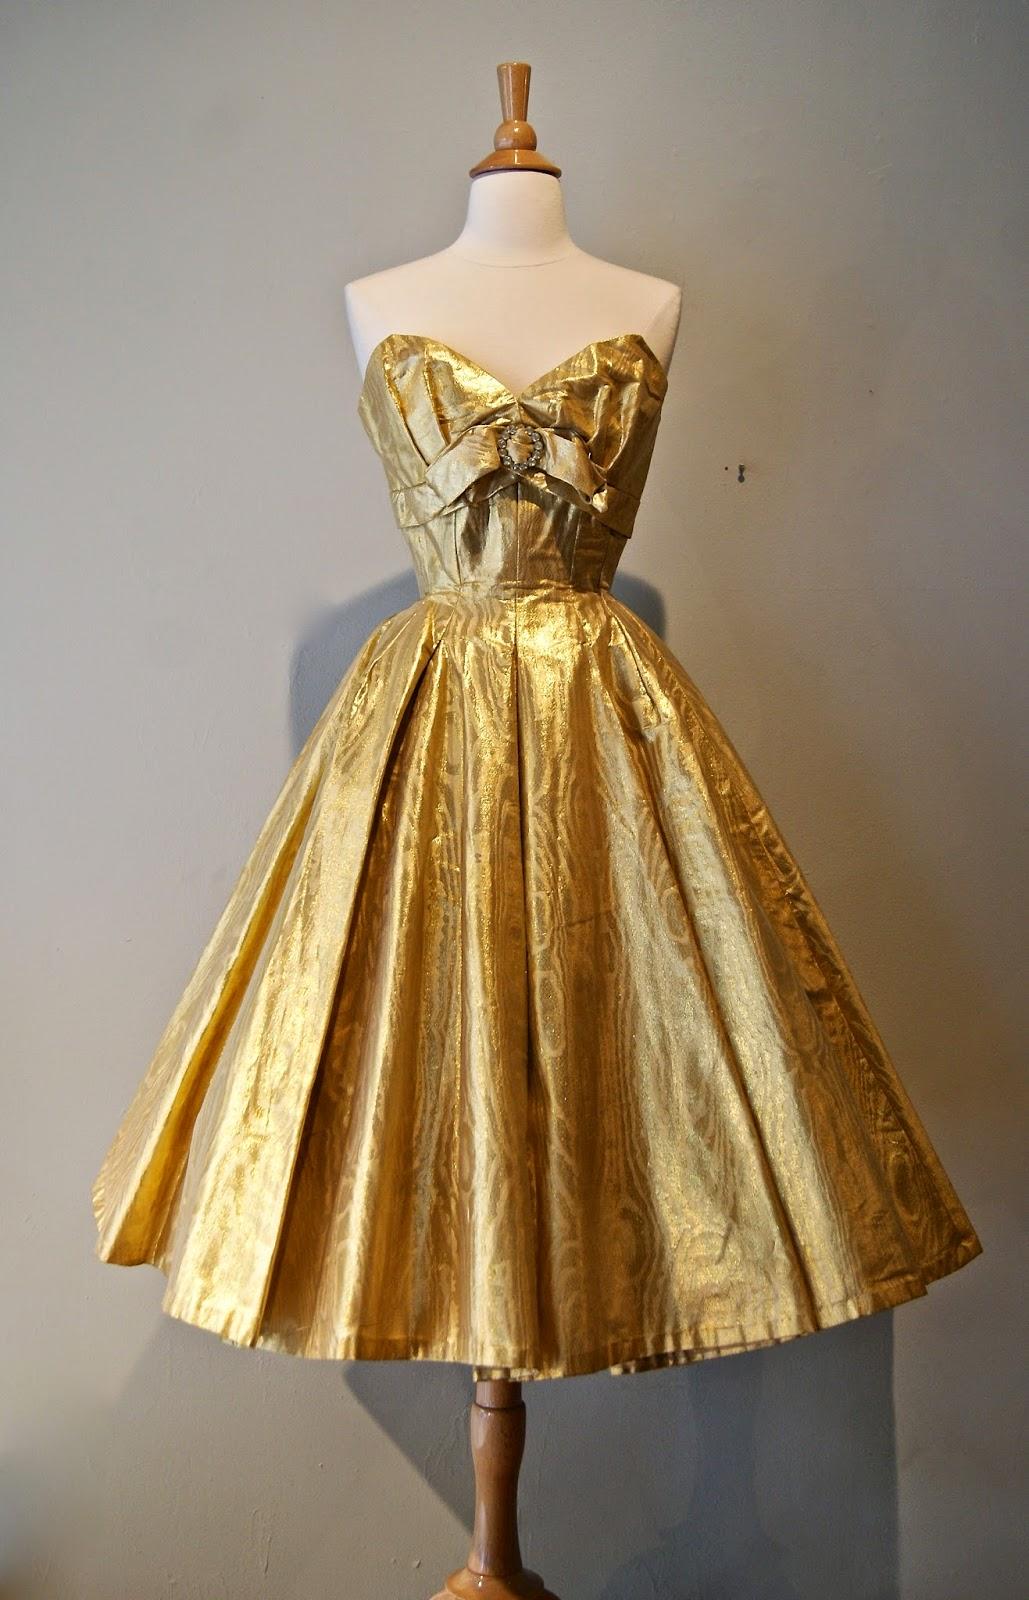 Xtabay Vintage Clothing Boutique - Portland, Oregon: New Arrivals ...